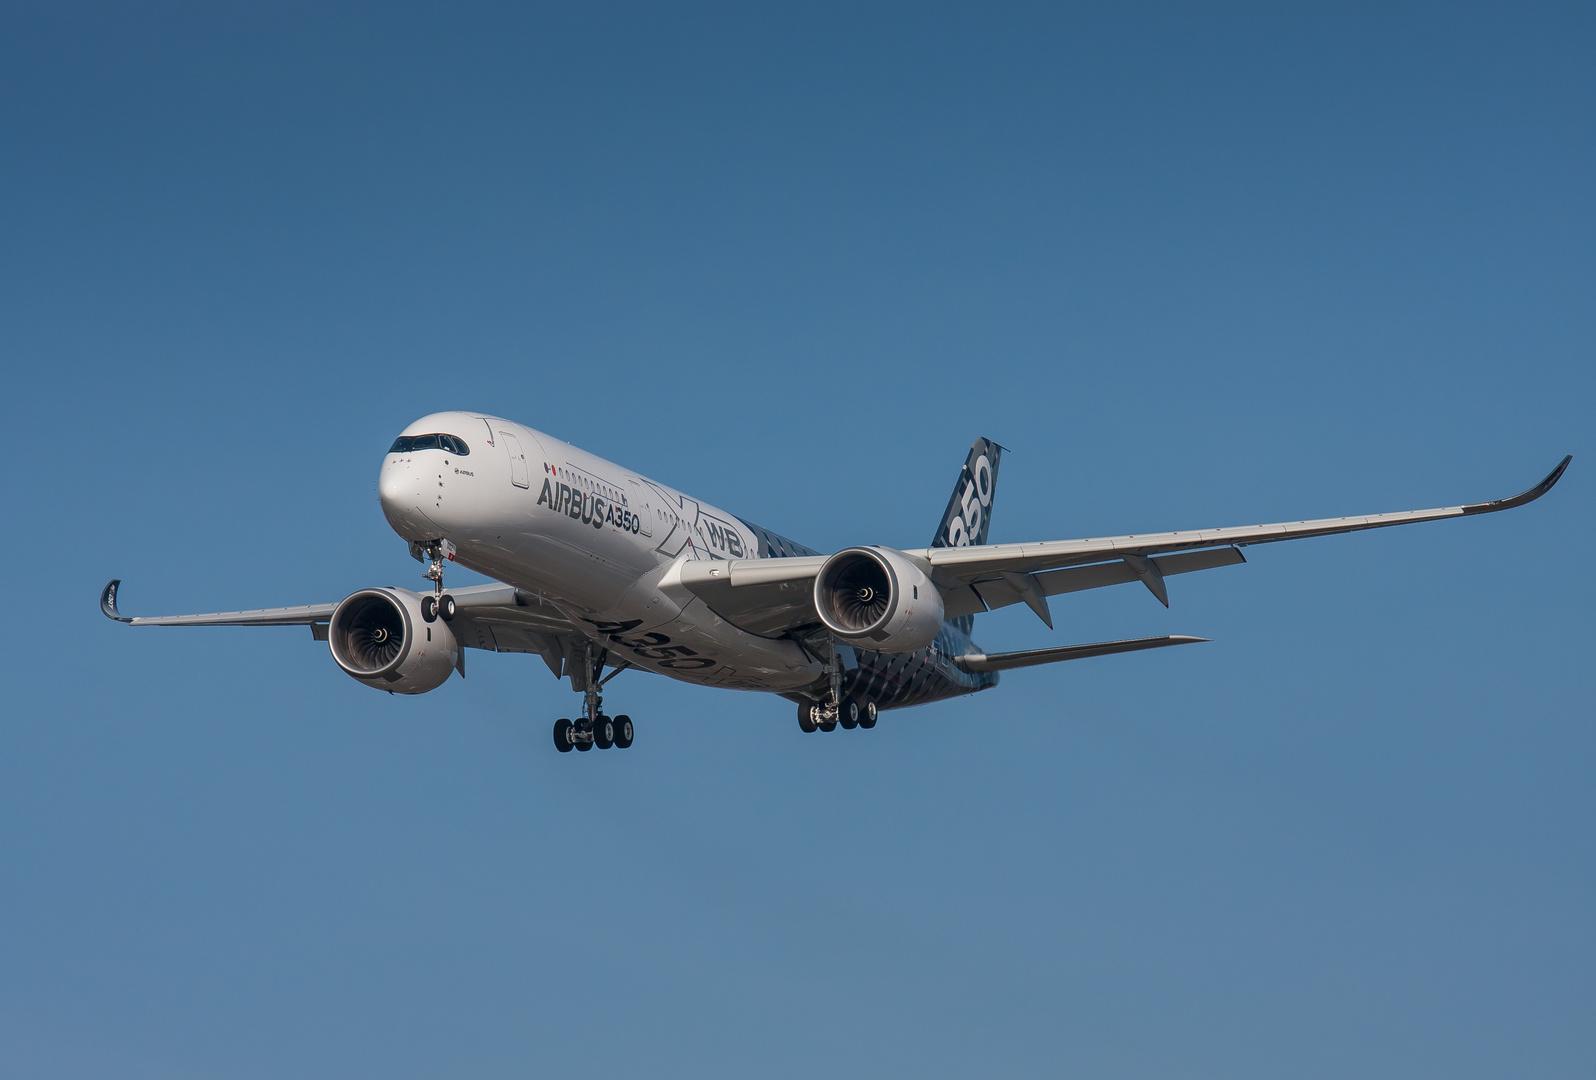 A350-900 XWB